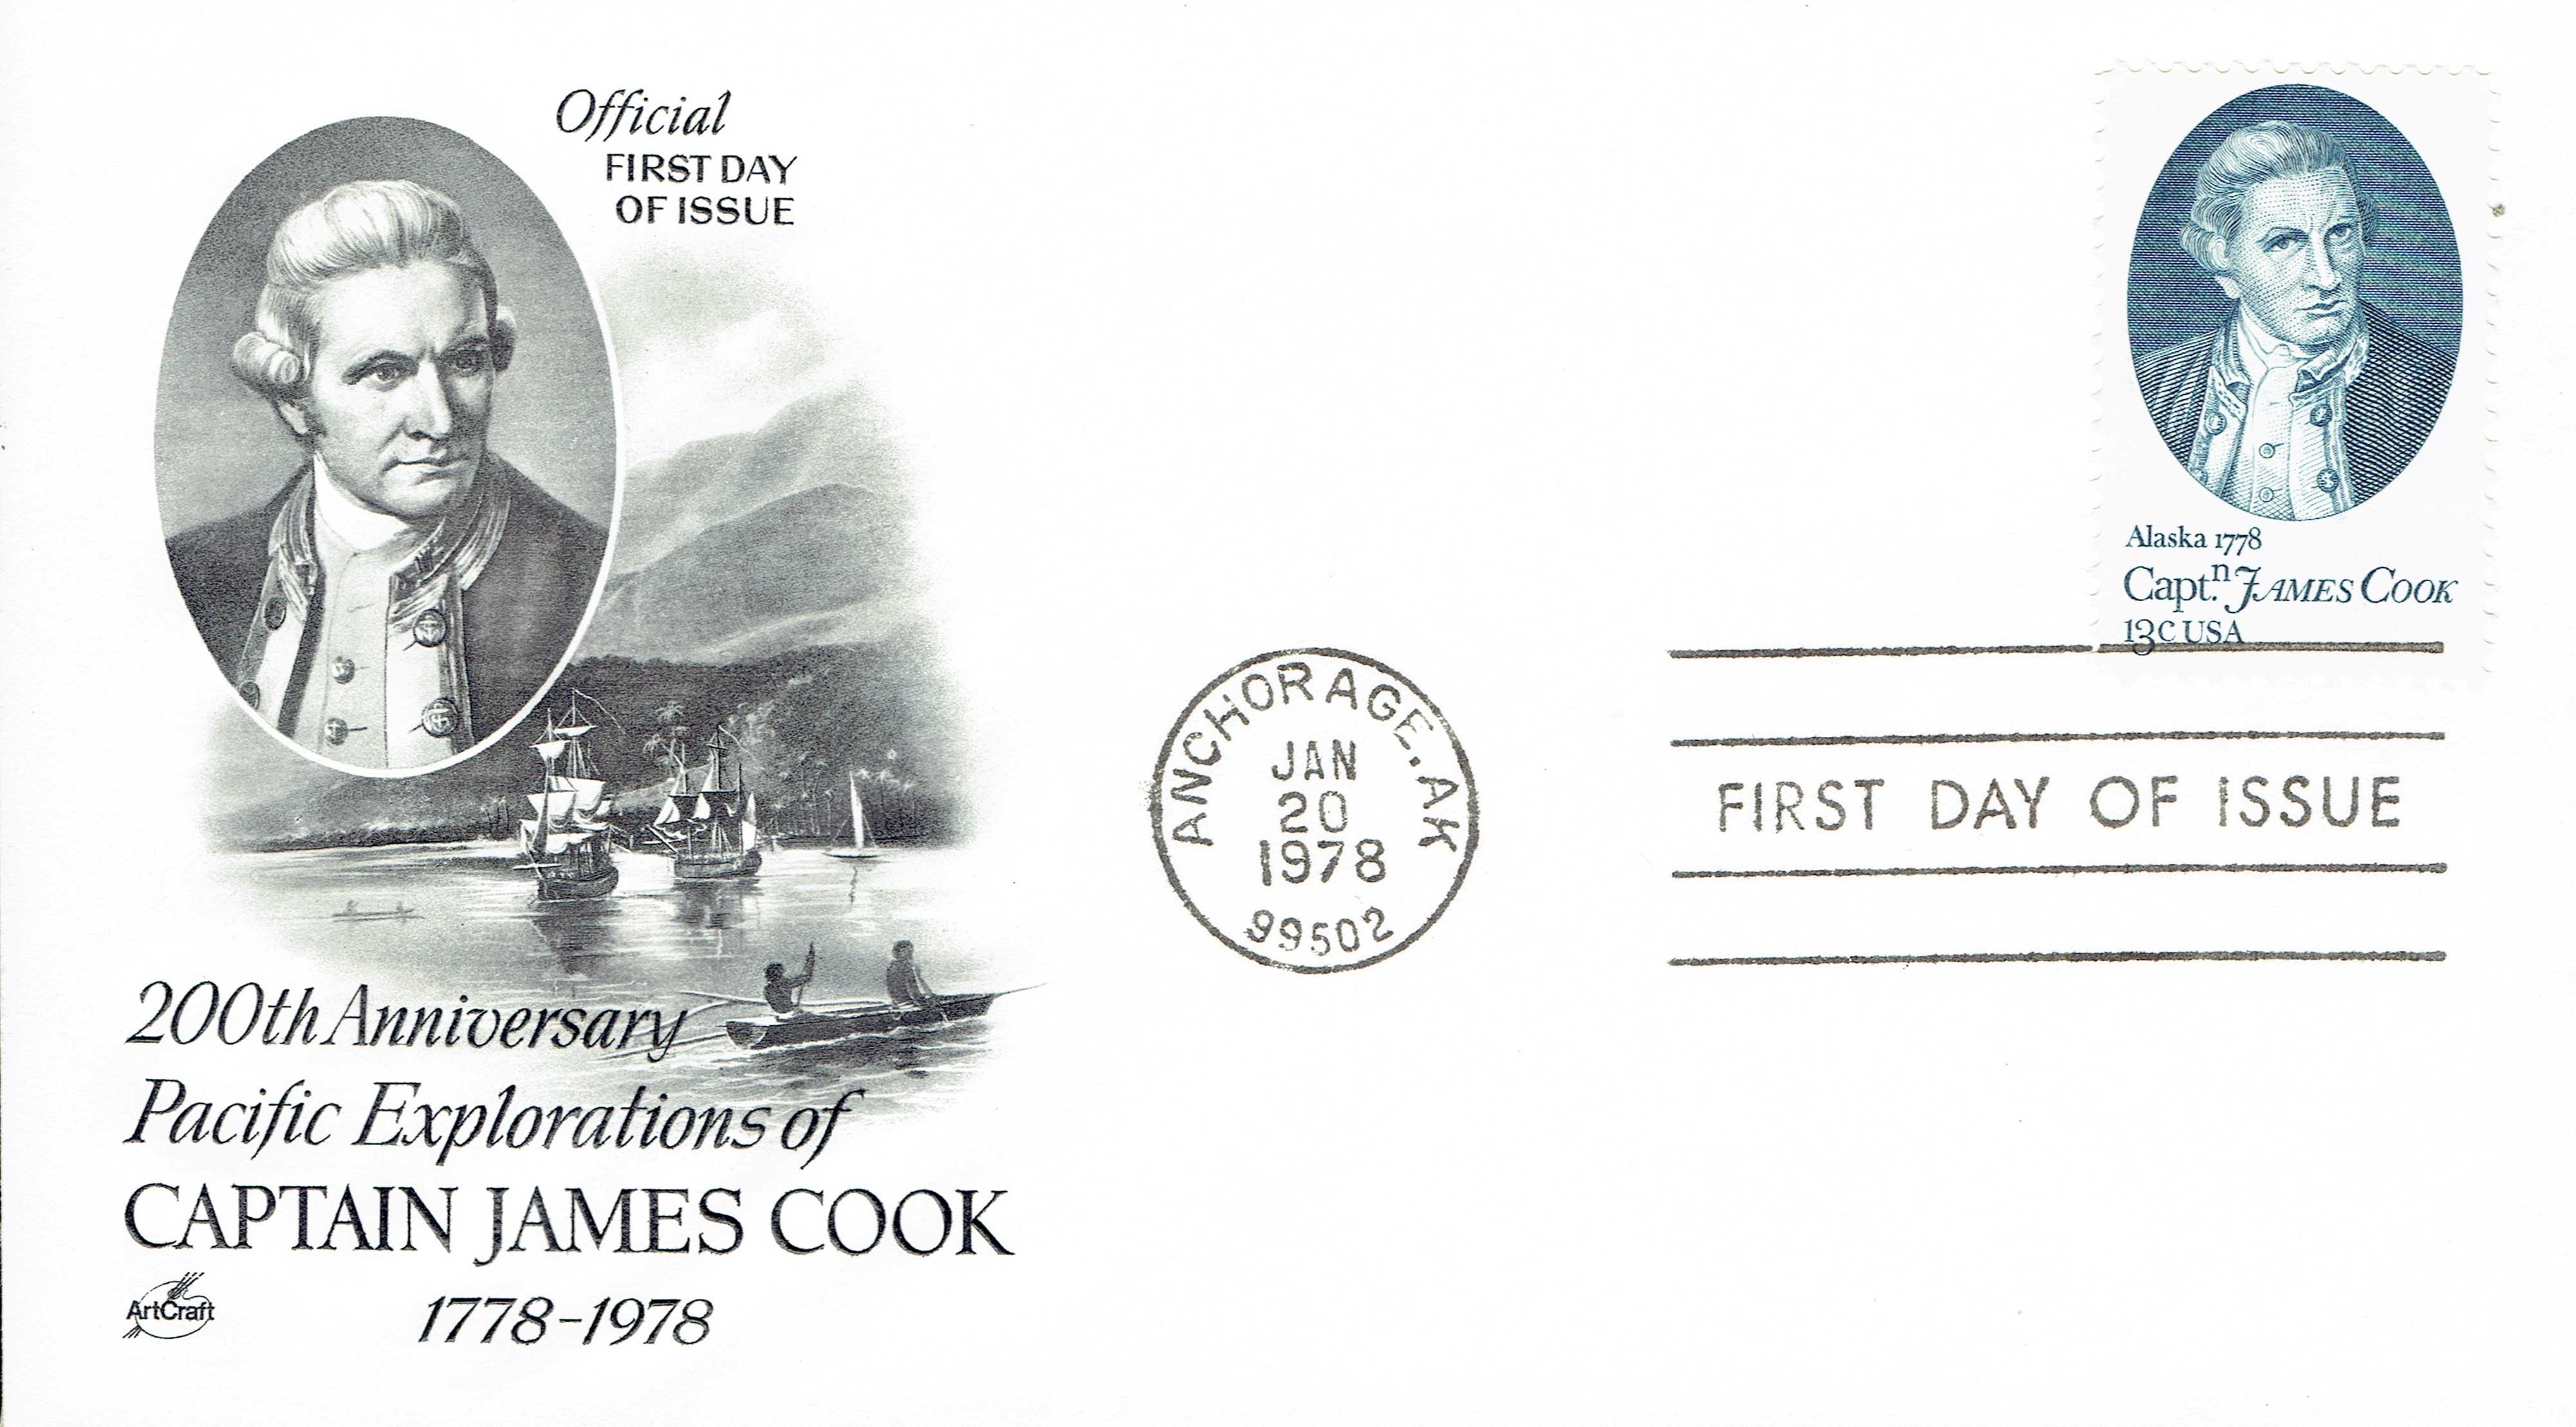 United States - Scott #1732 (1978): First Day Cover, ArtCraft cachet